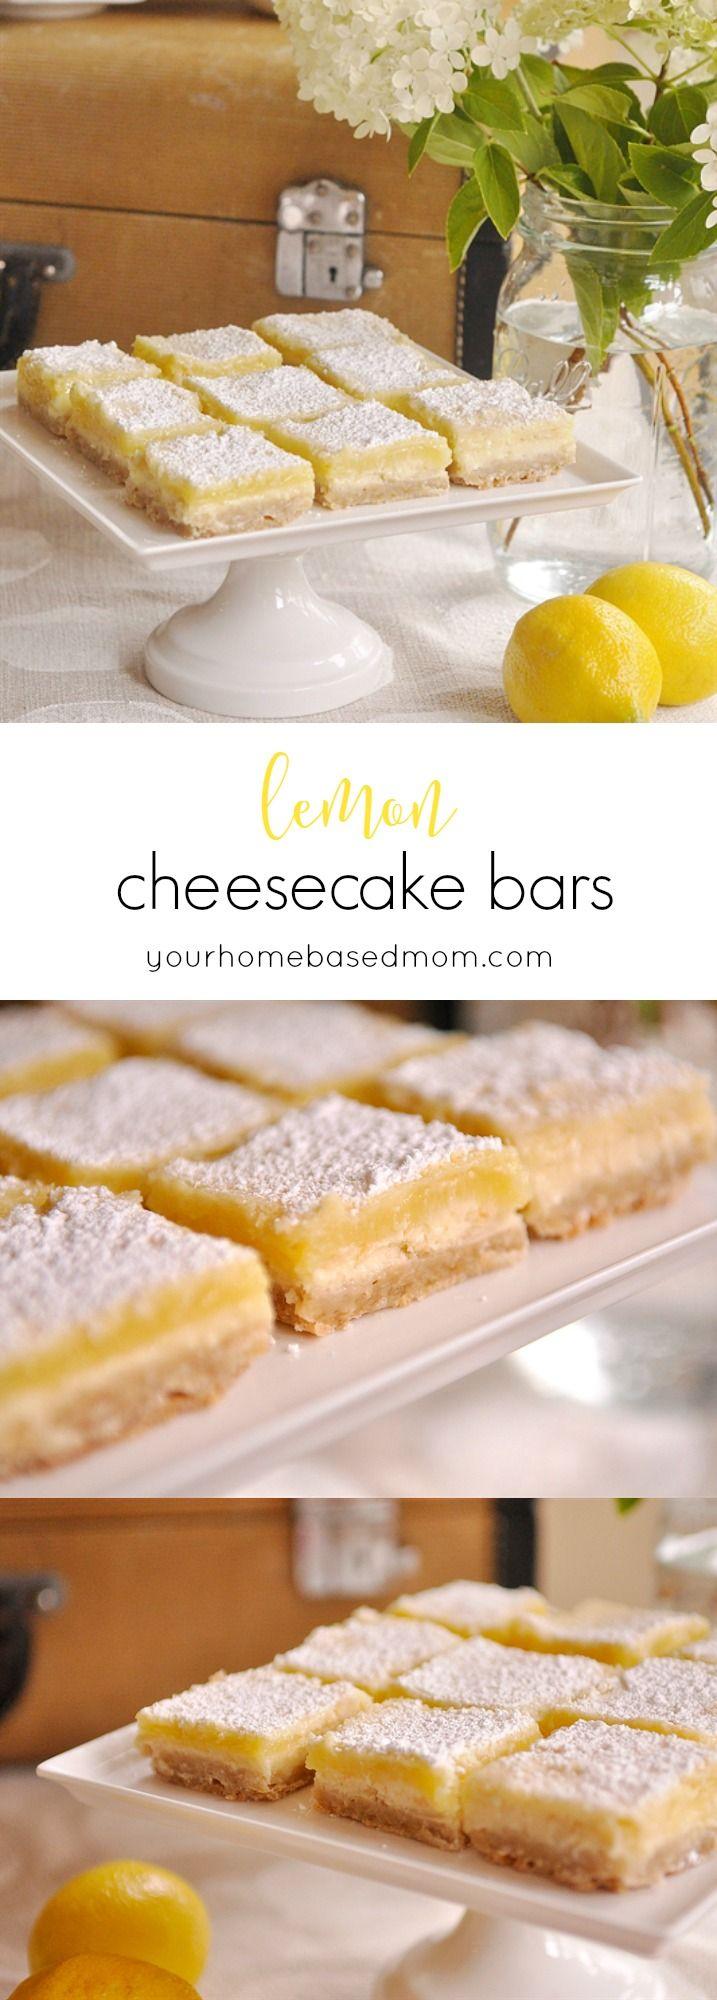 Lemon Cheesecake Bars - guaranteed to become your favorite lemon bar ever! A layer of cheesecake, then regular lemon bars on top!